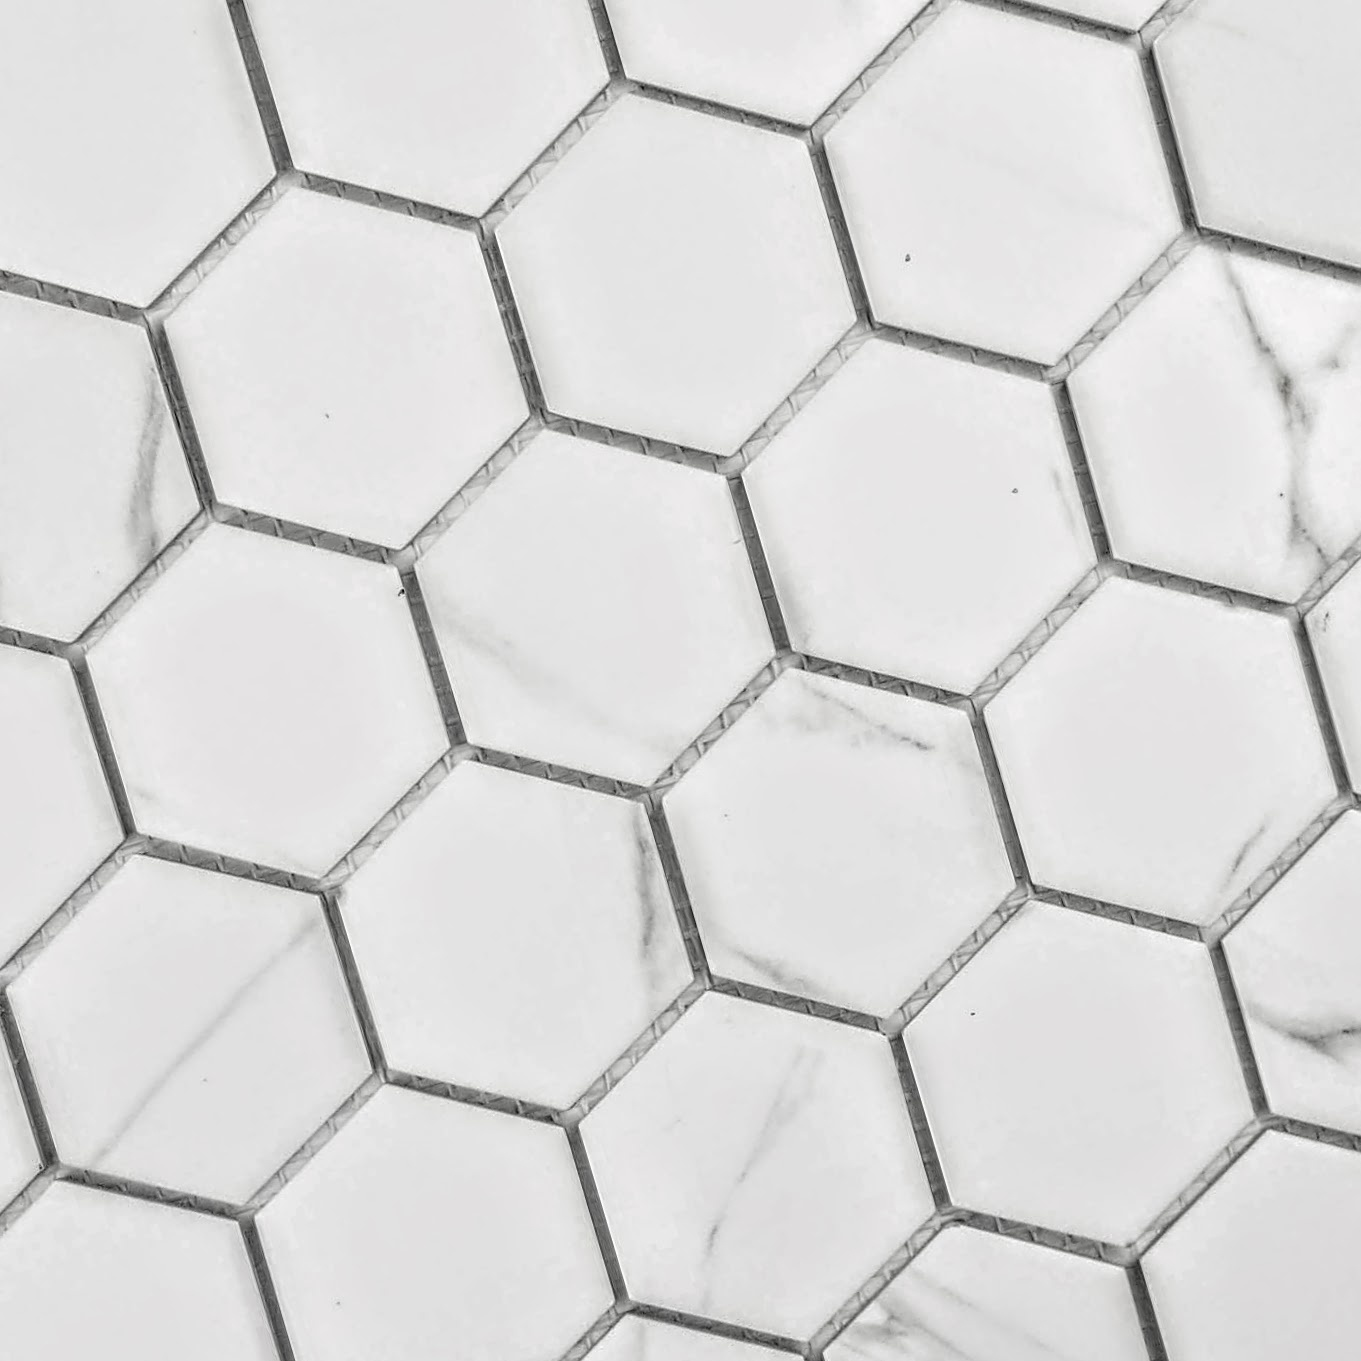 "Monet 2"" x 2"" Matte White Porcelain Hexagon Backsplash Mosaic Wall Tile"